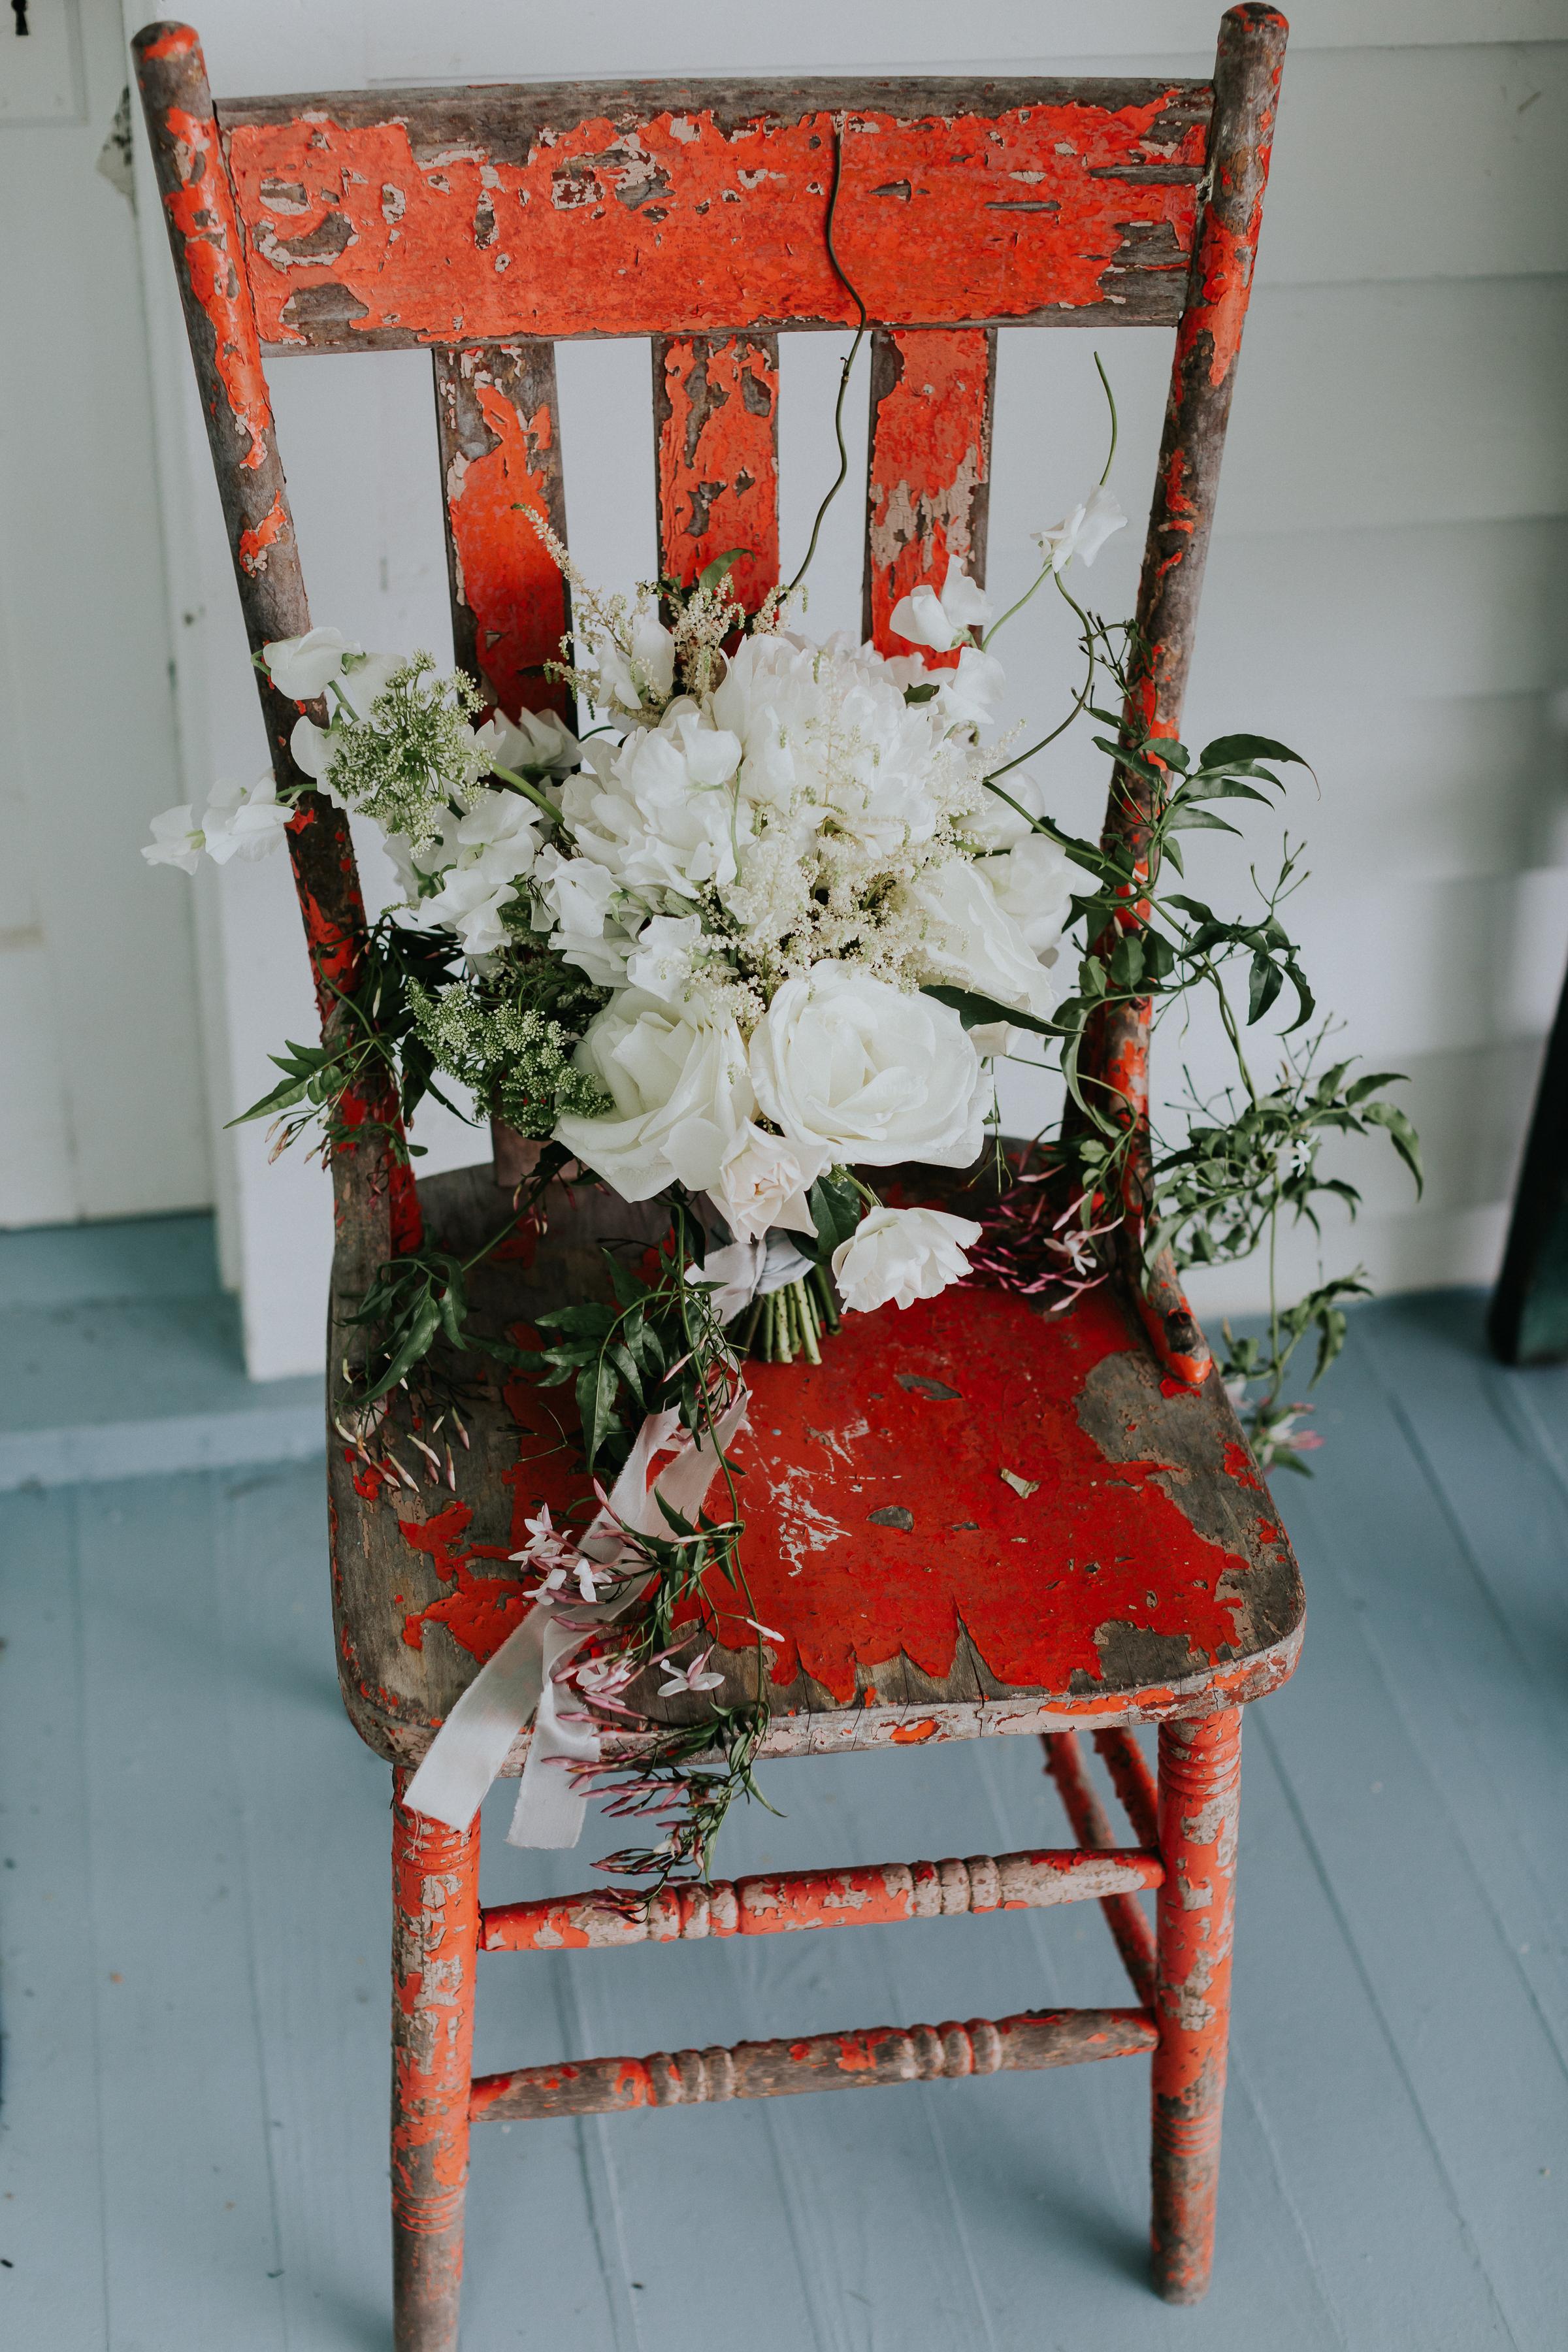 Handsome-Hollow-Long-Eddy-Catskills-New-York-Fine-Art-Documentary-Wedding-Photographer-8.jpg